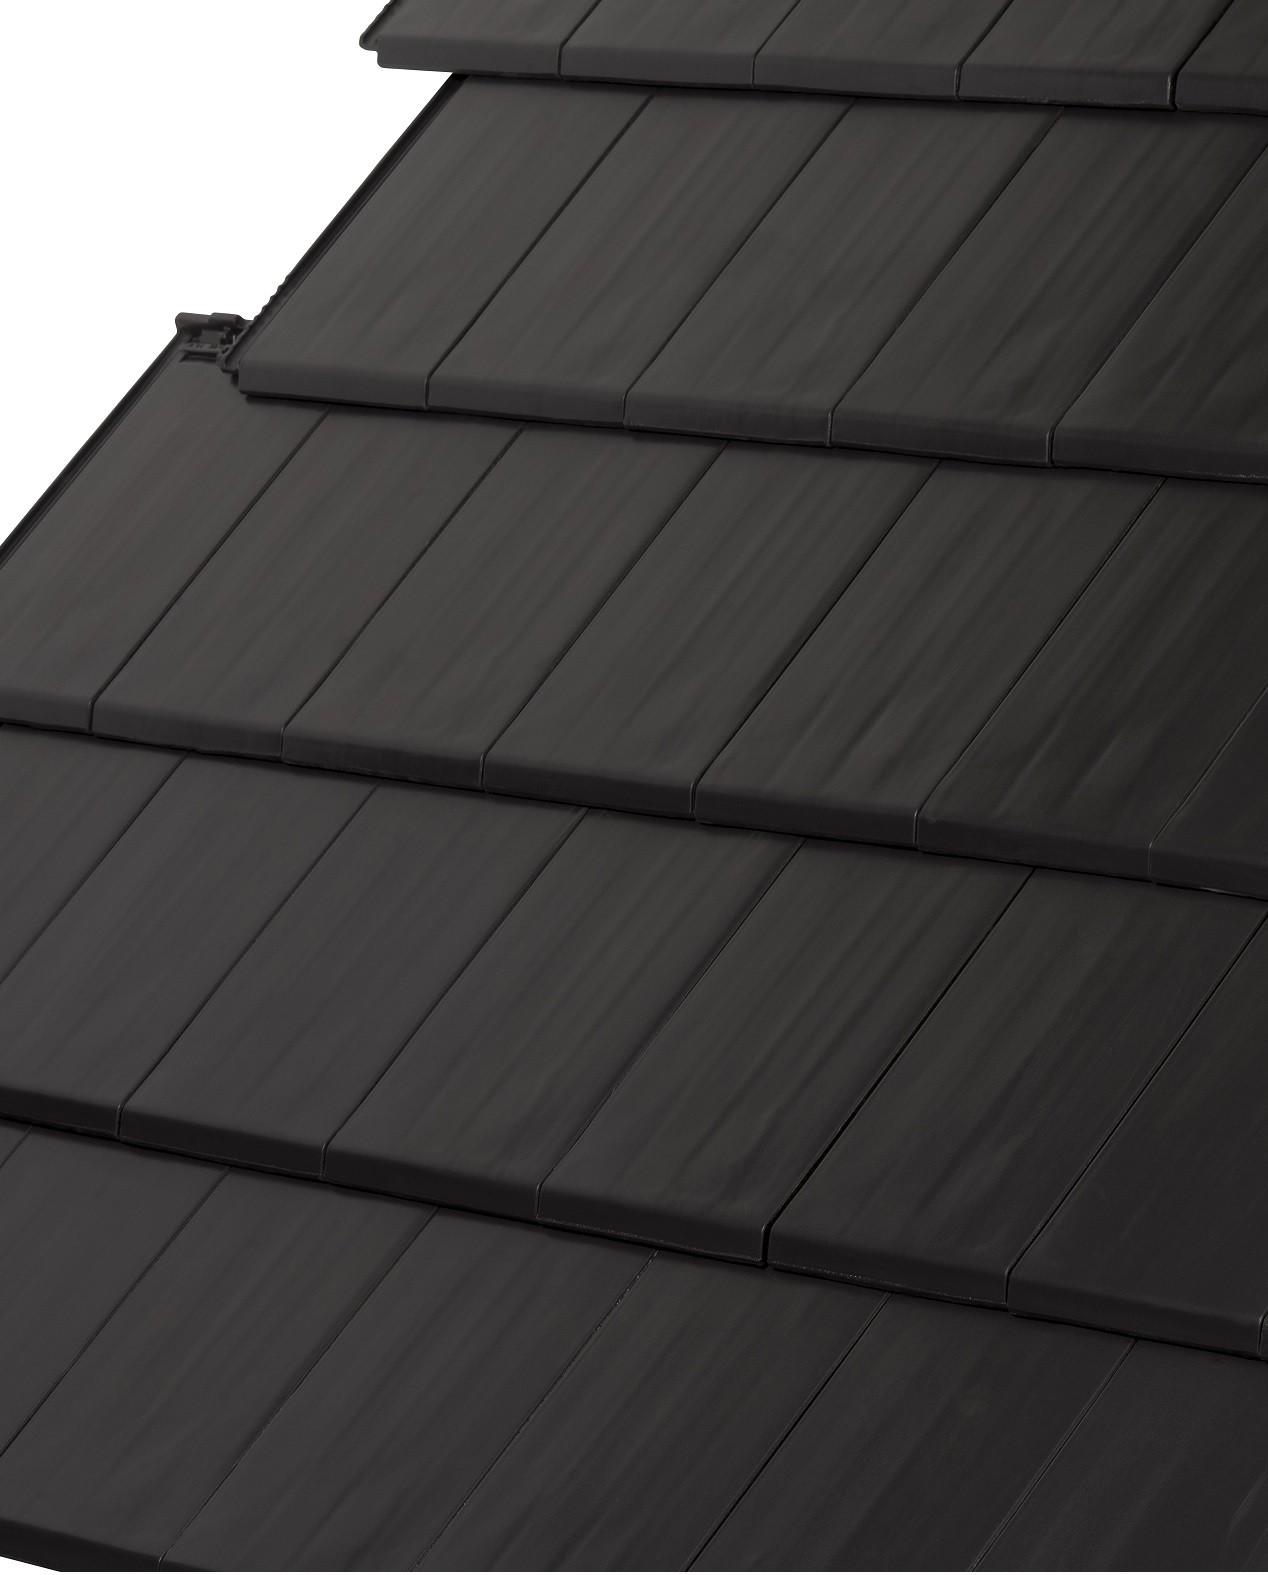 LAGAN SHETLAND CLAY Roof TILE BLACK  LAGSCTBK